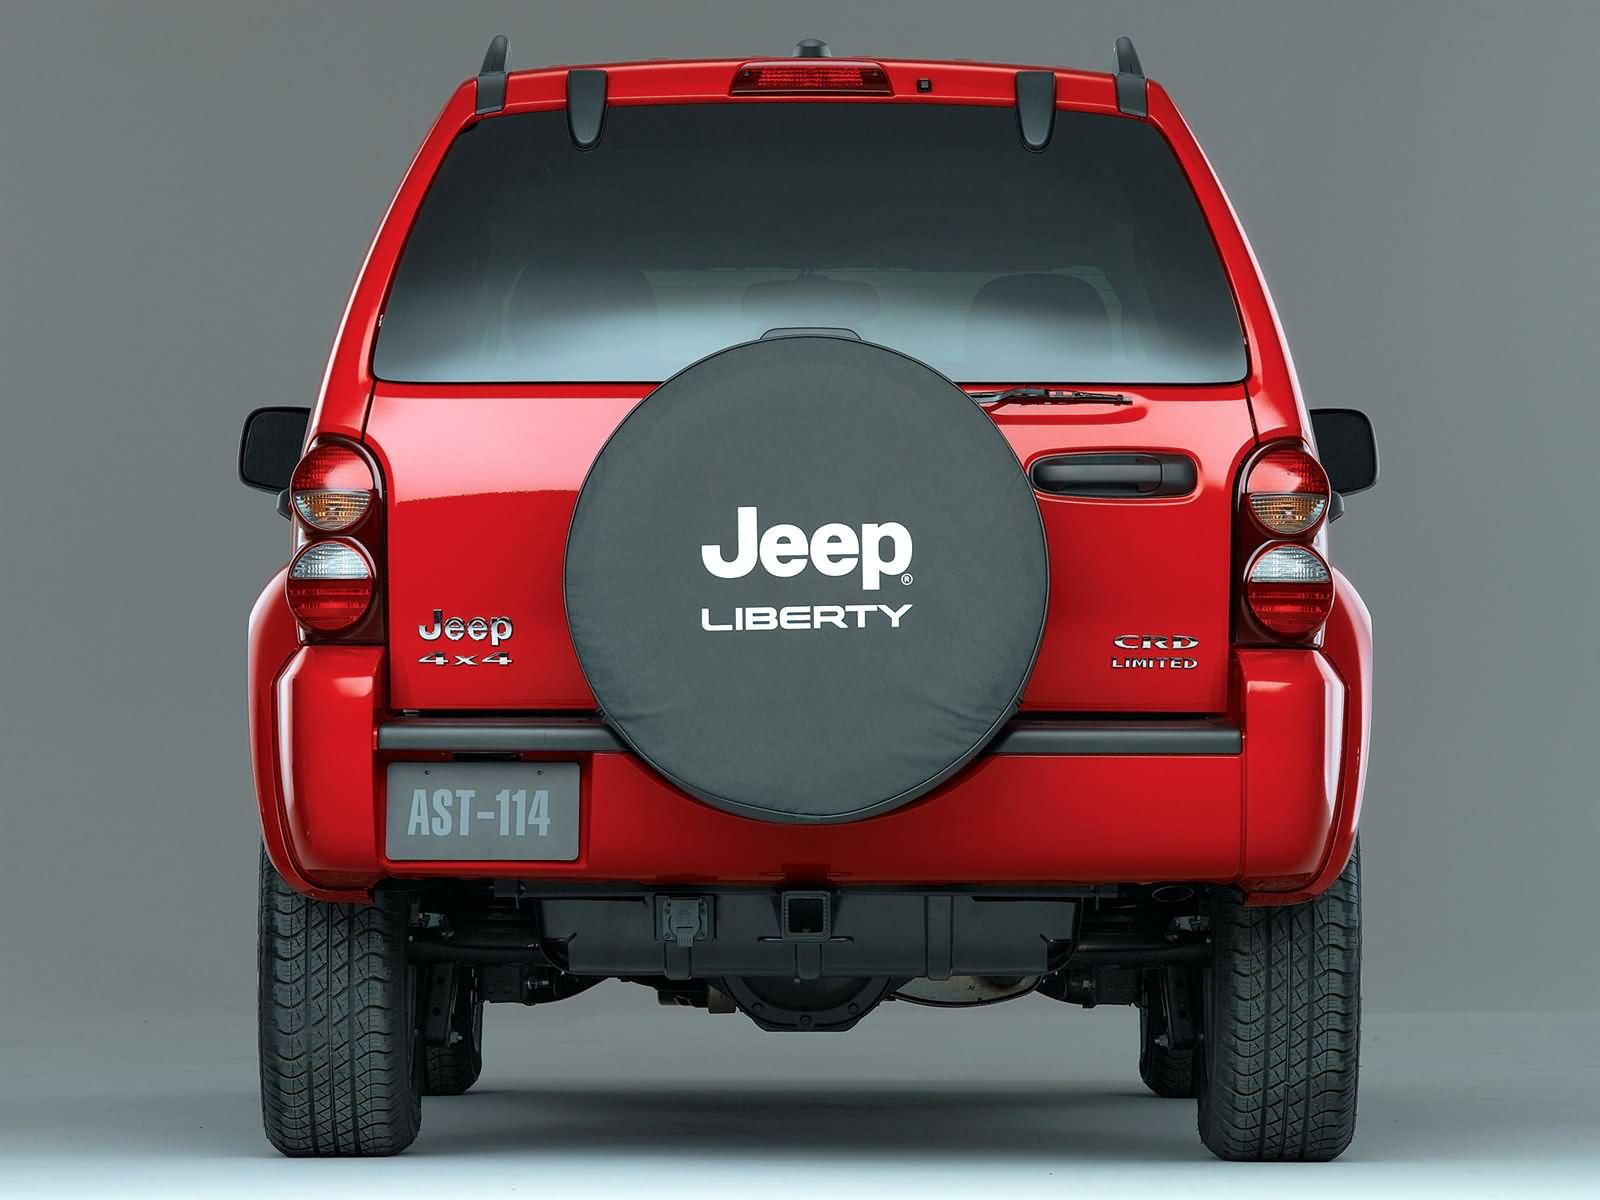 Jeep Liberty photo #7850